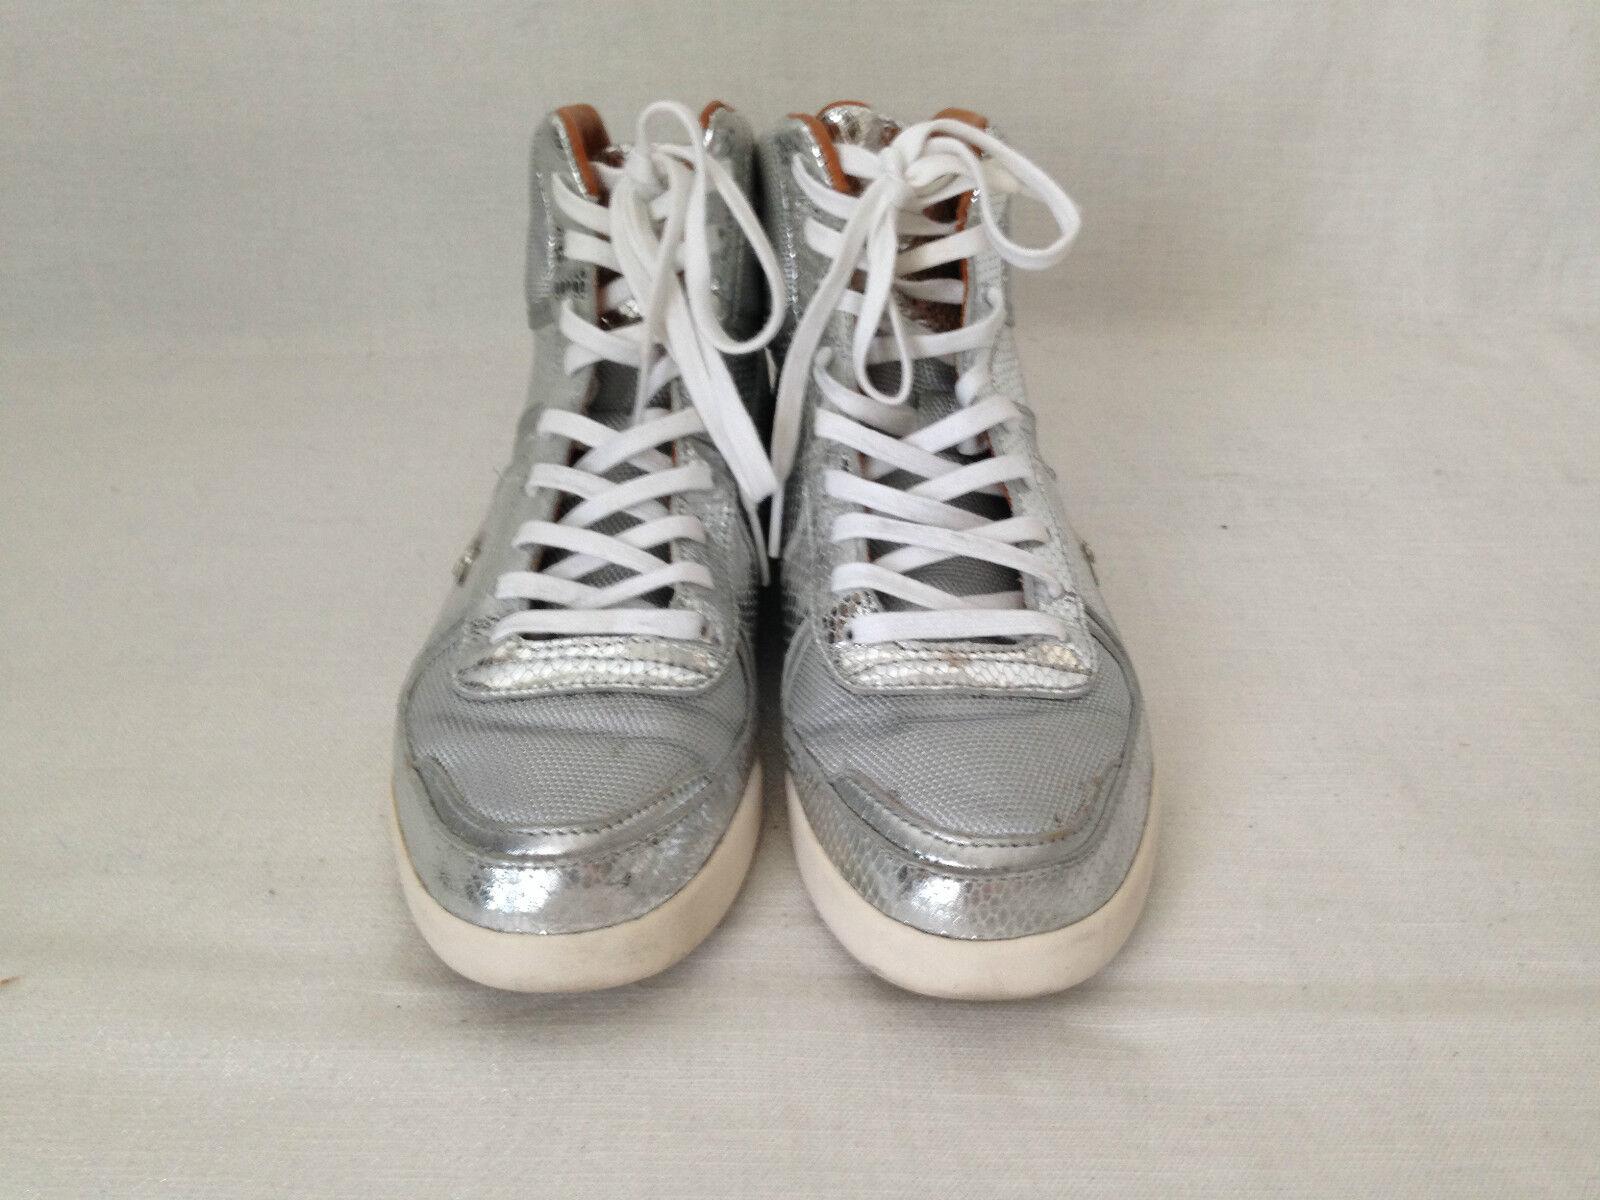 Unisex Creative Recreation Metallic Silver 9 Snakeskin, leather lining Hightops. 9 Silver 30517e